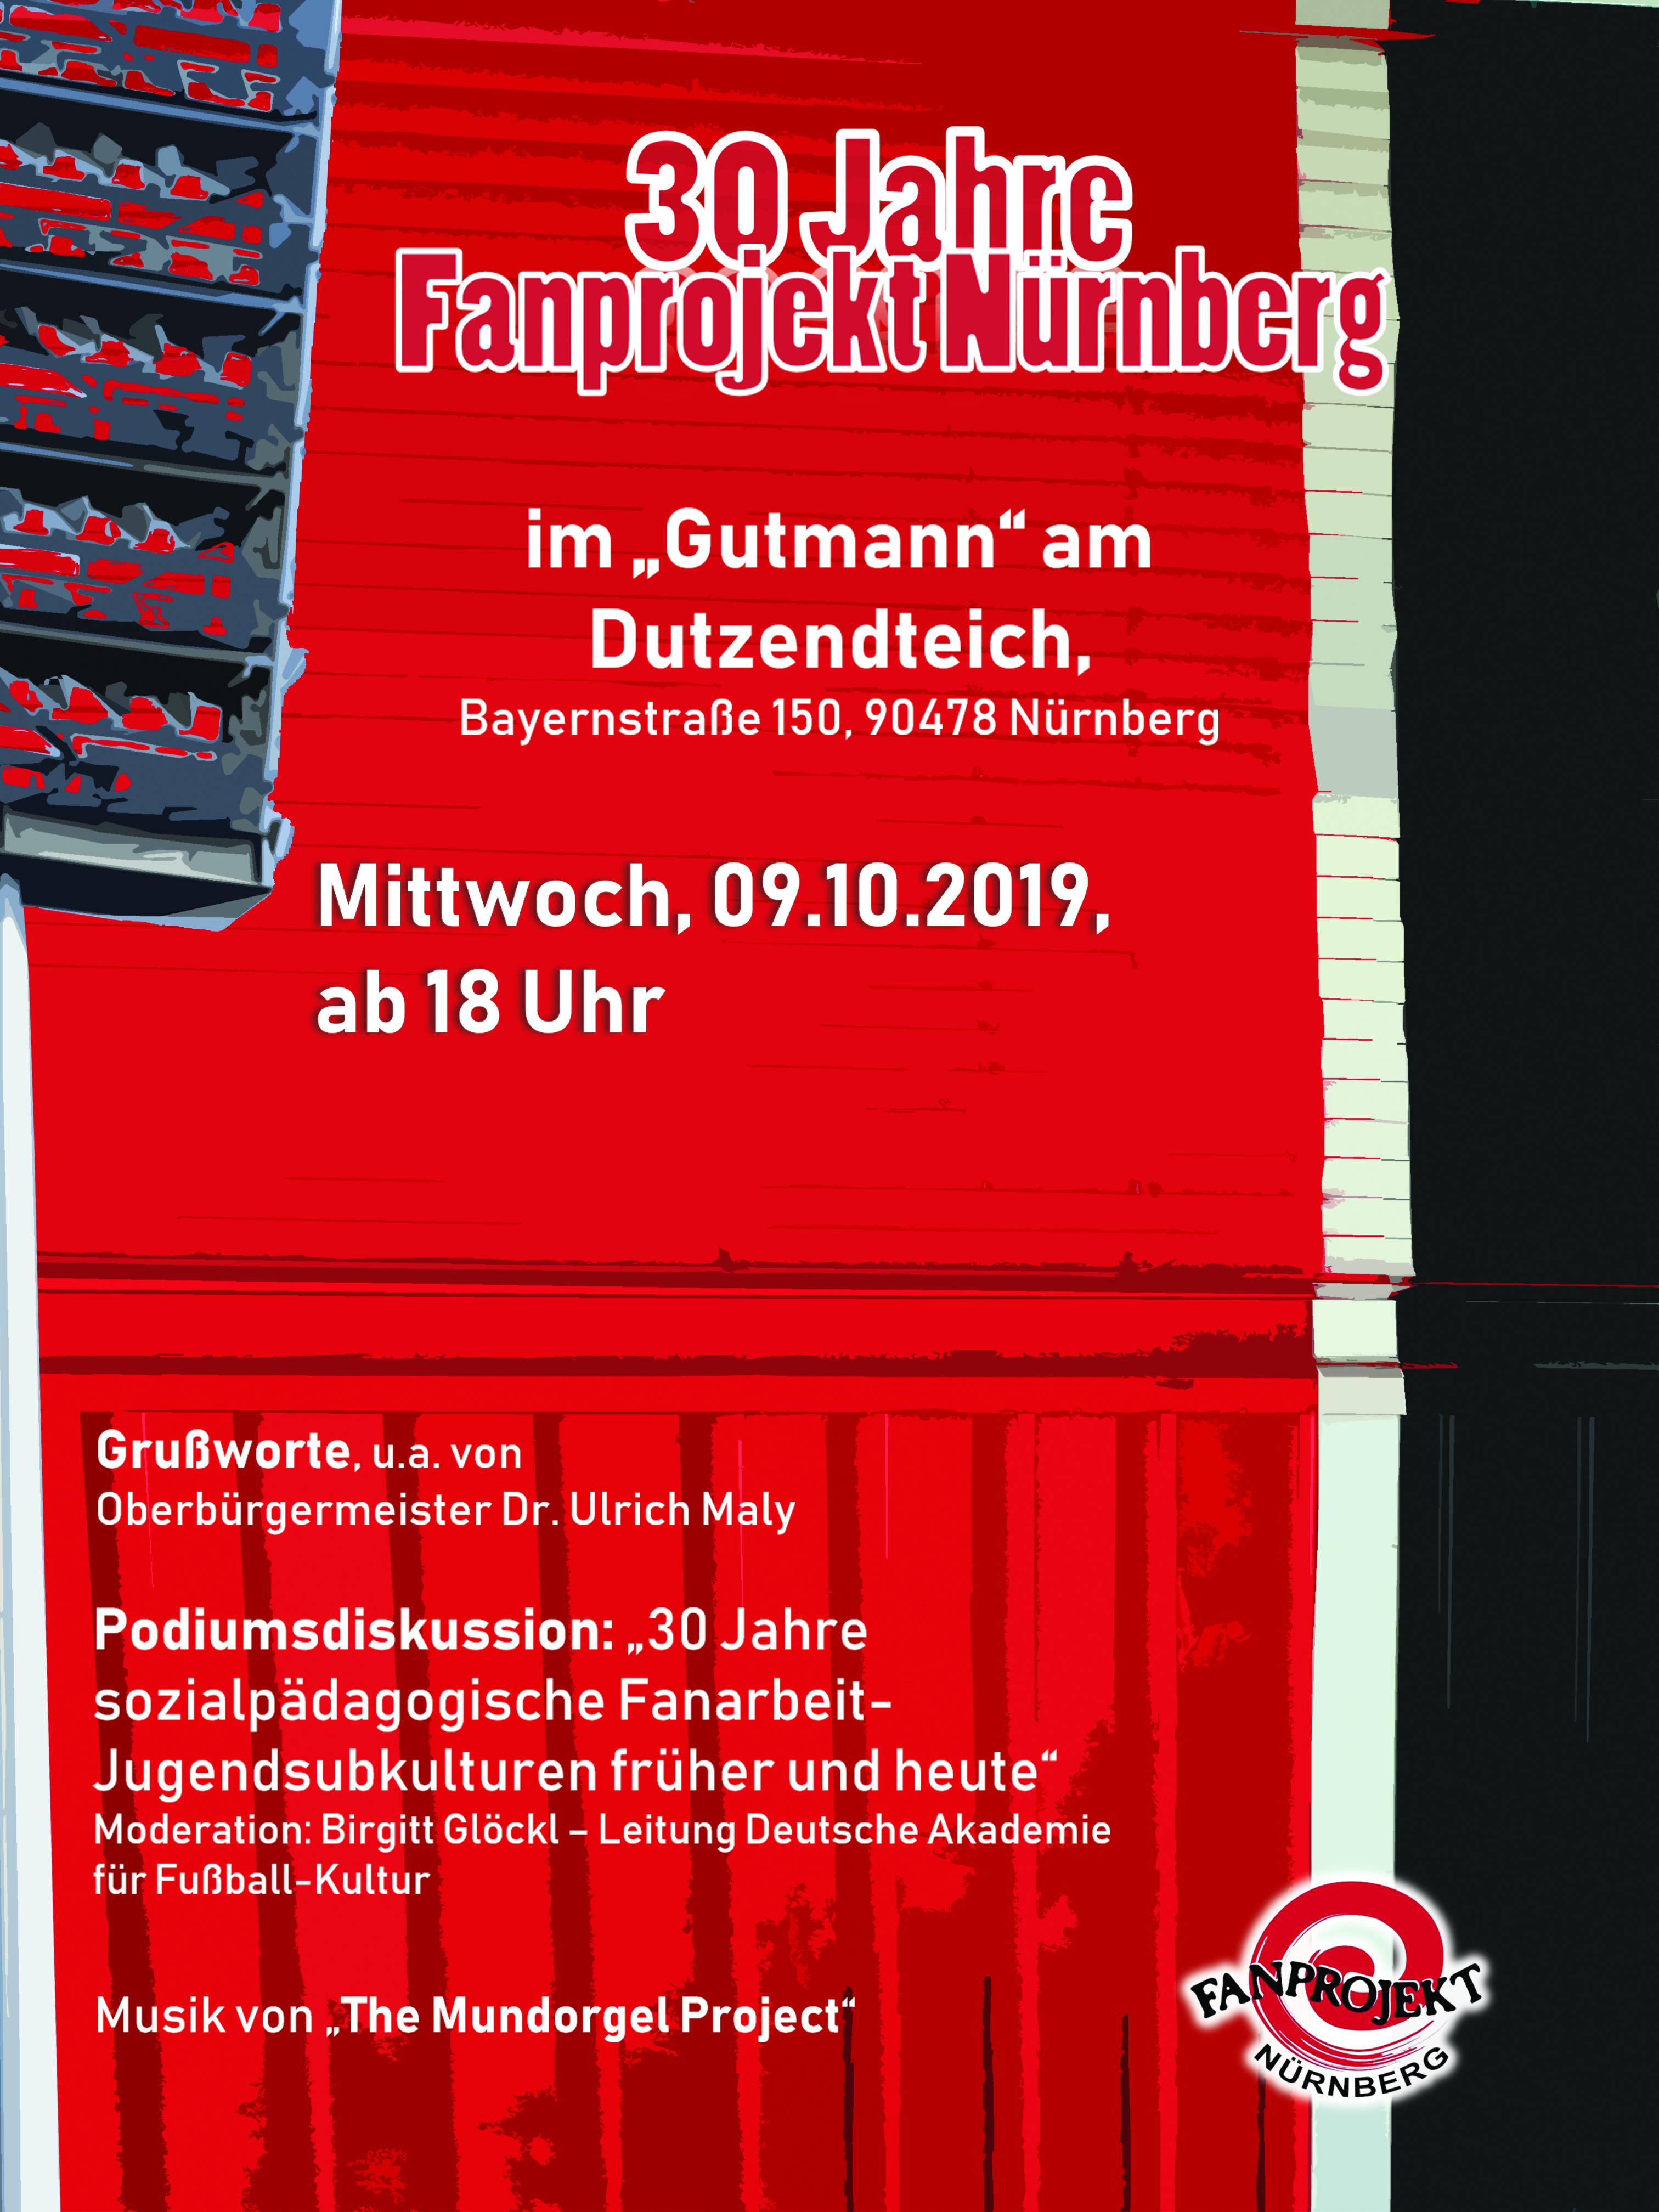 30 Jahre Fanprojekt Nürnberg